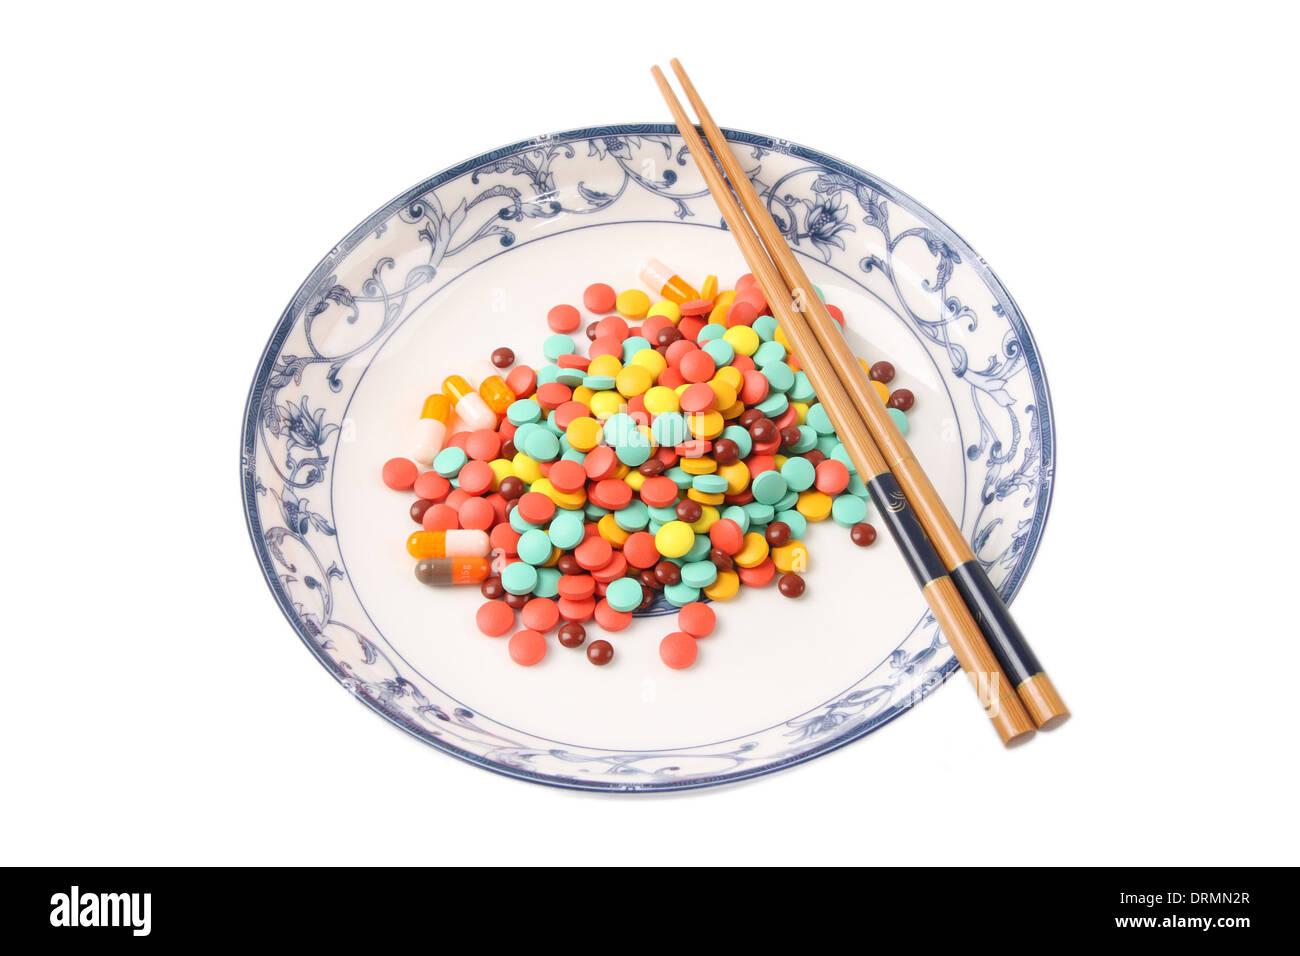 overdose medicine - Stock Image